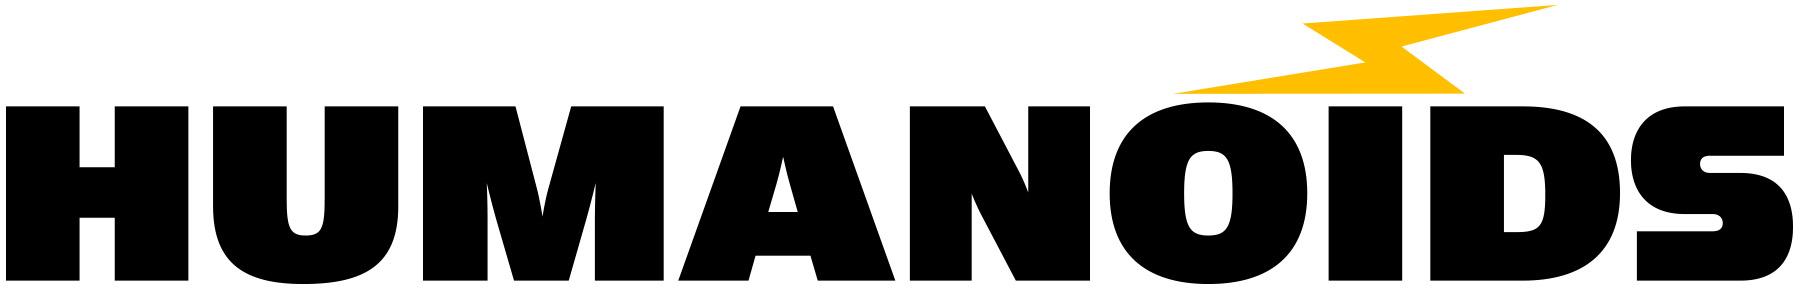 Humanoids-Logo (1).jpg